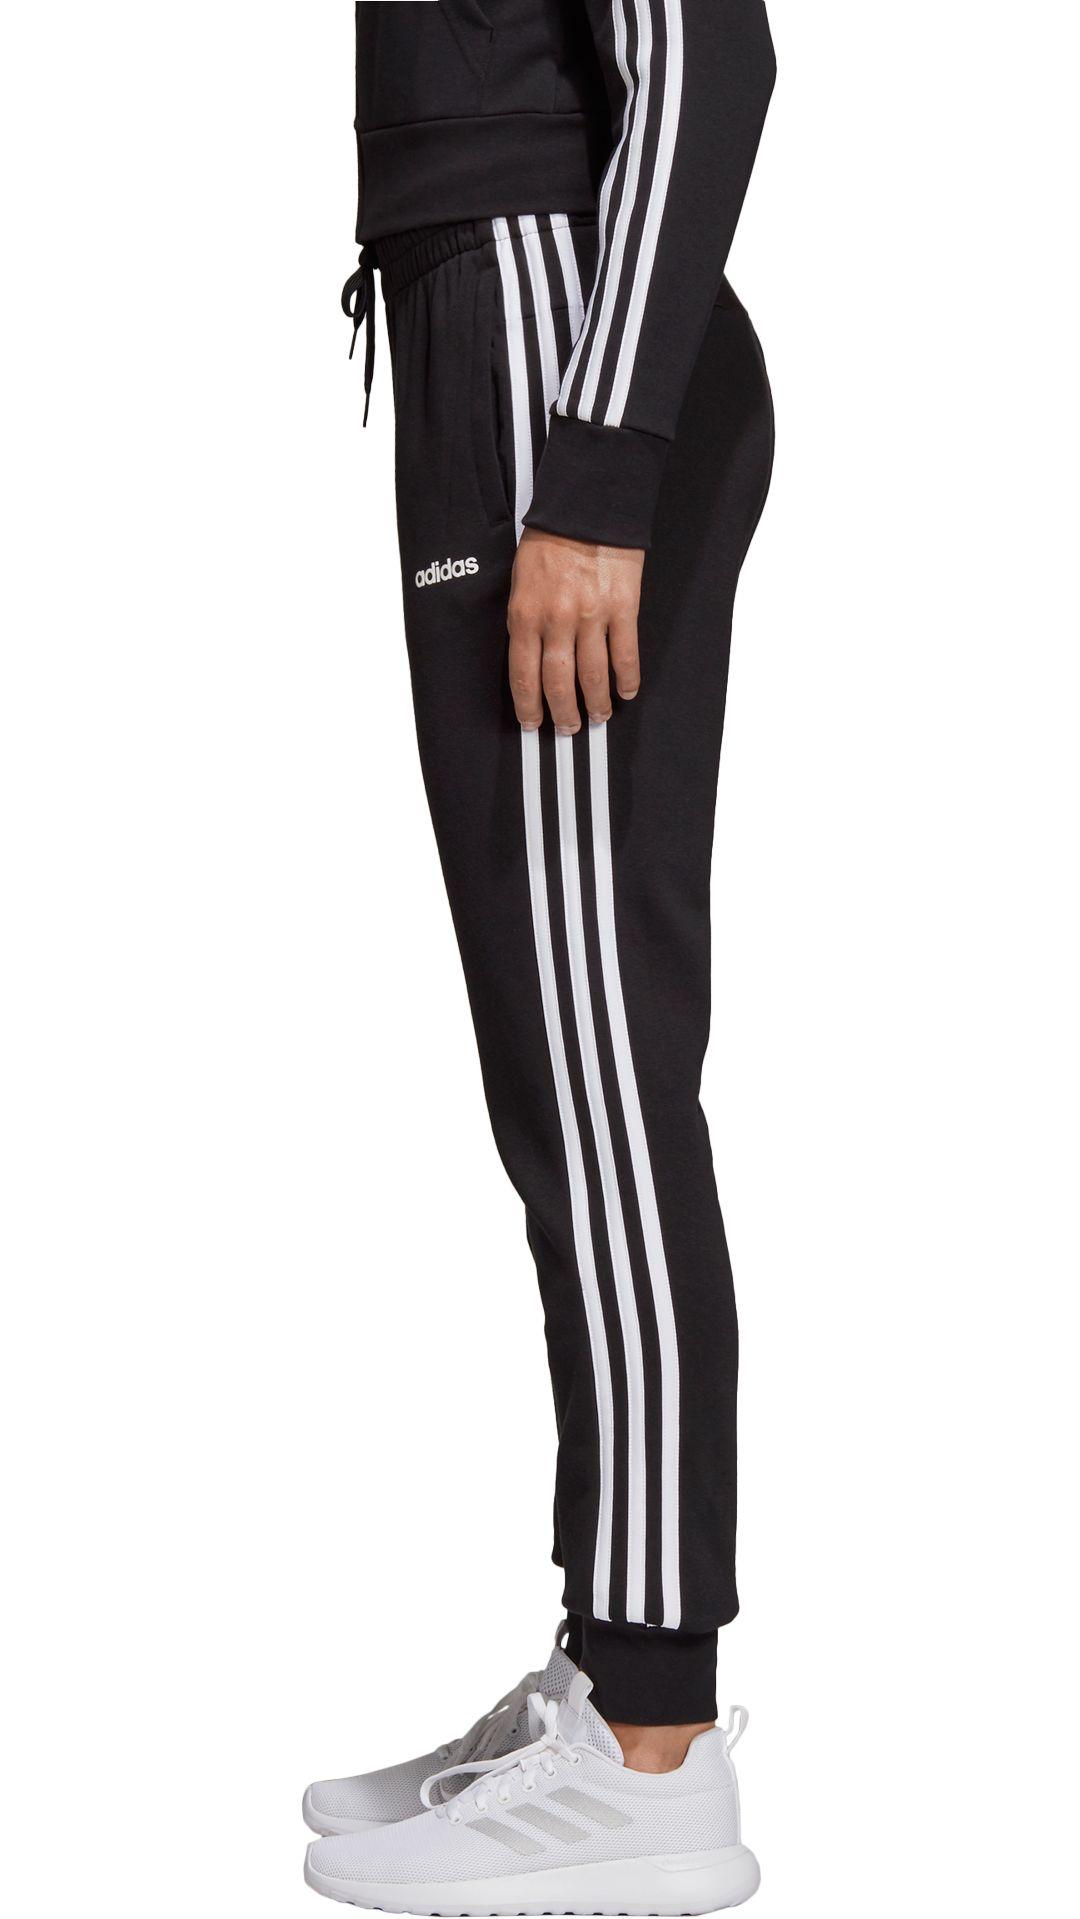 ccd7f971 adidas Women's Essentials 3-Stripe Cotton Fleece Jogger Pants.  noImageFound. Previous